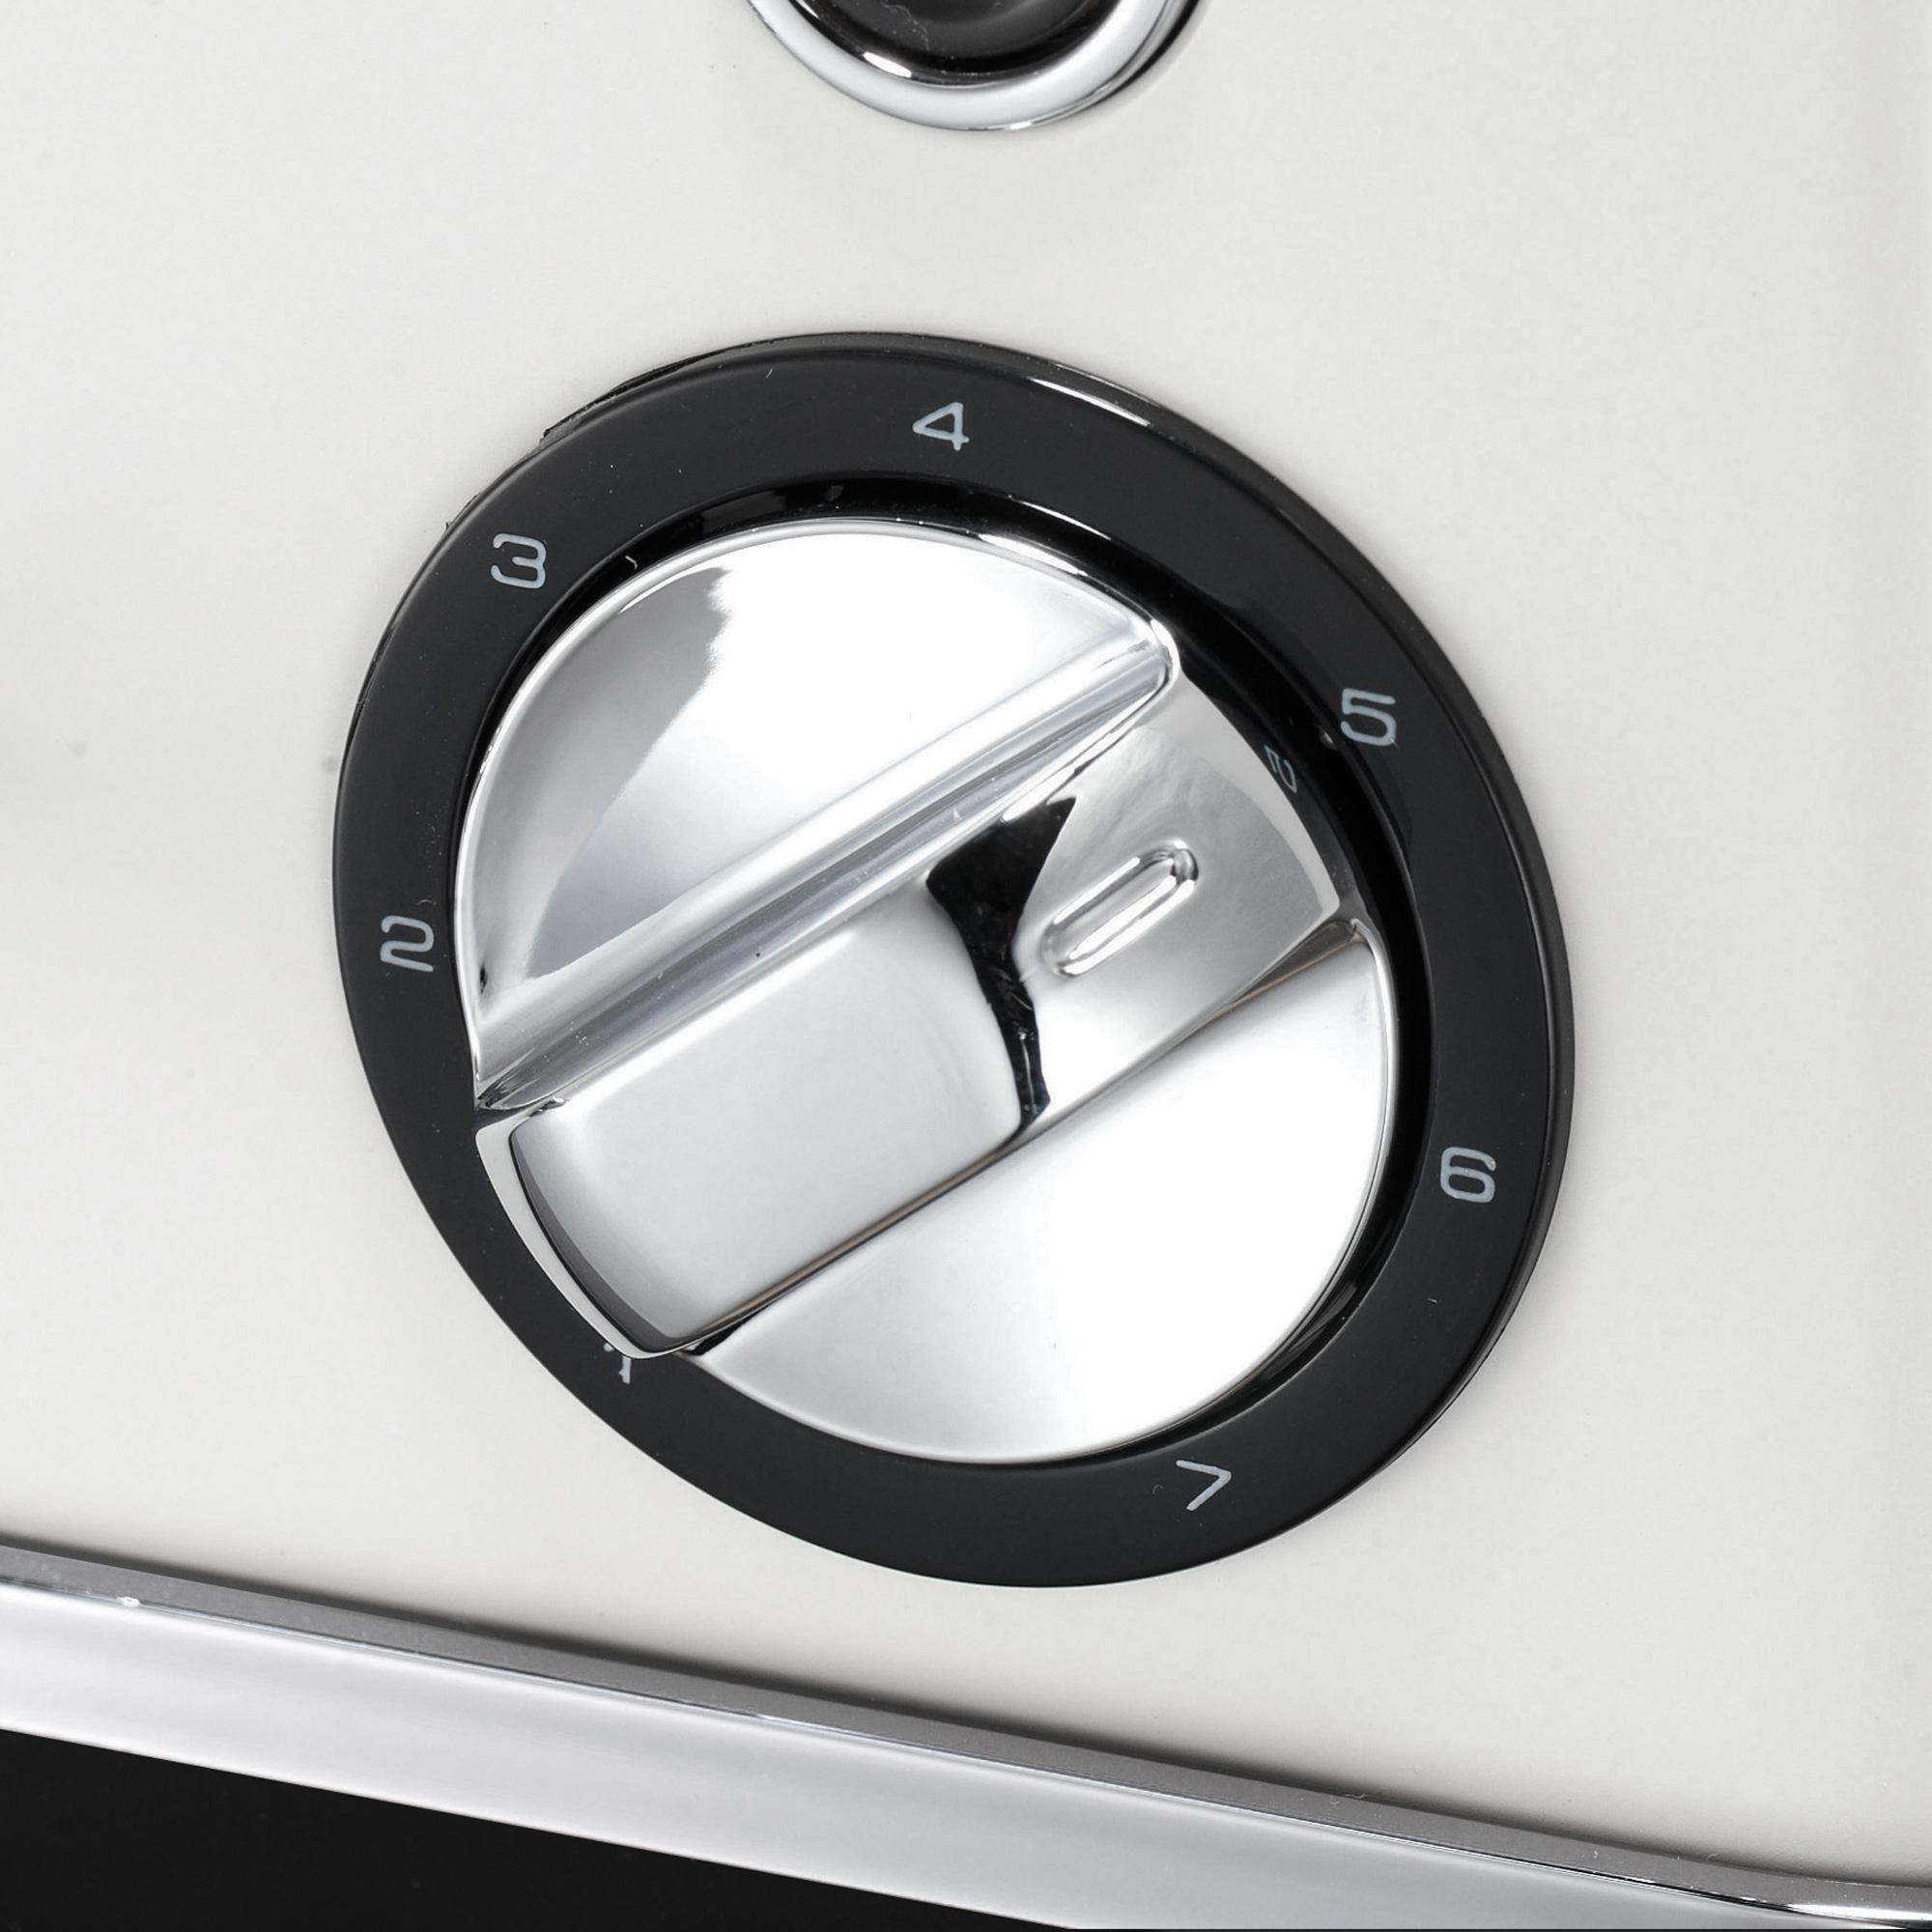 toaster accents 4 schlitz wei morphy richards. Black Bedroom Furniture Sets. Home Design Ideas